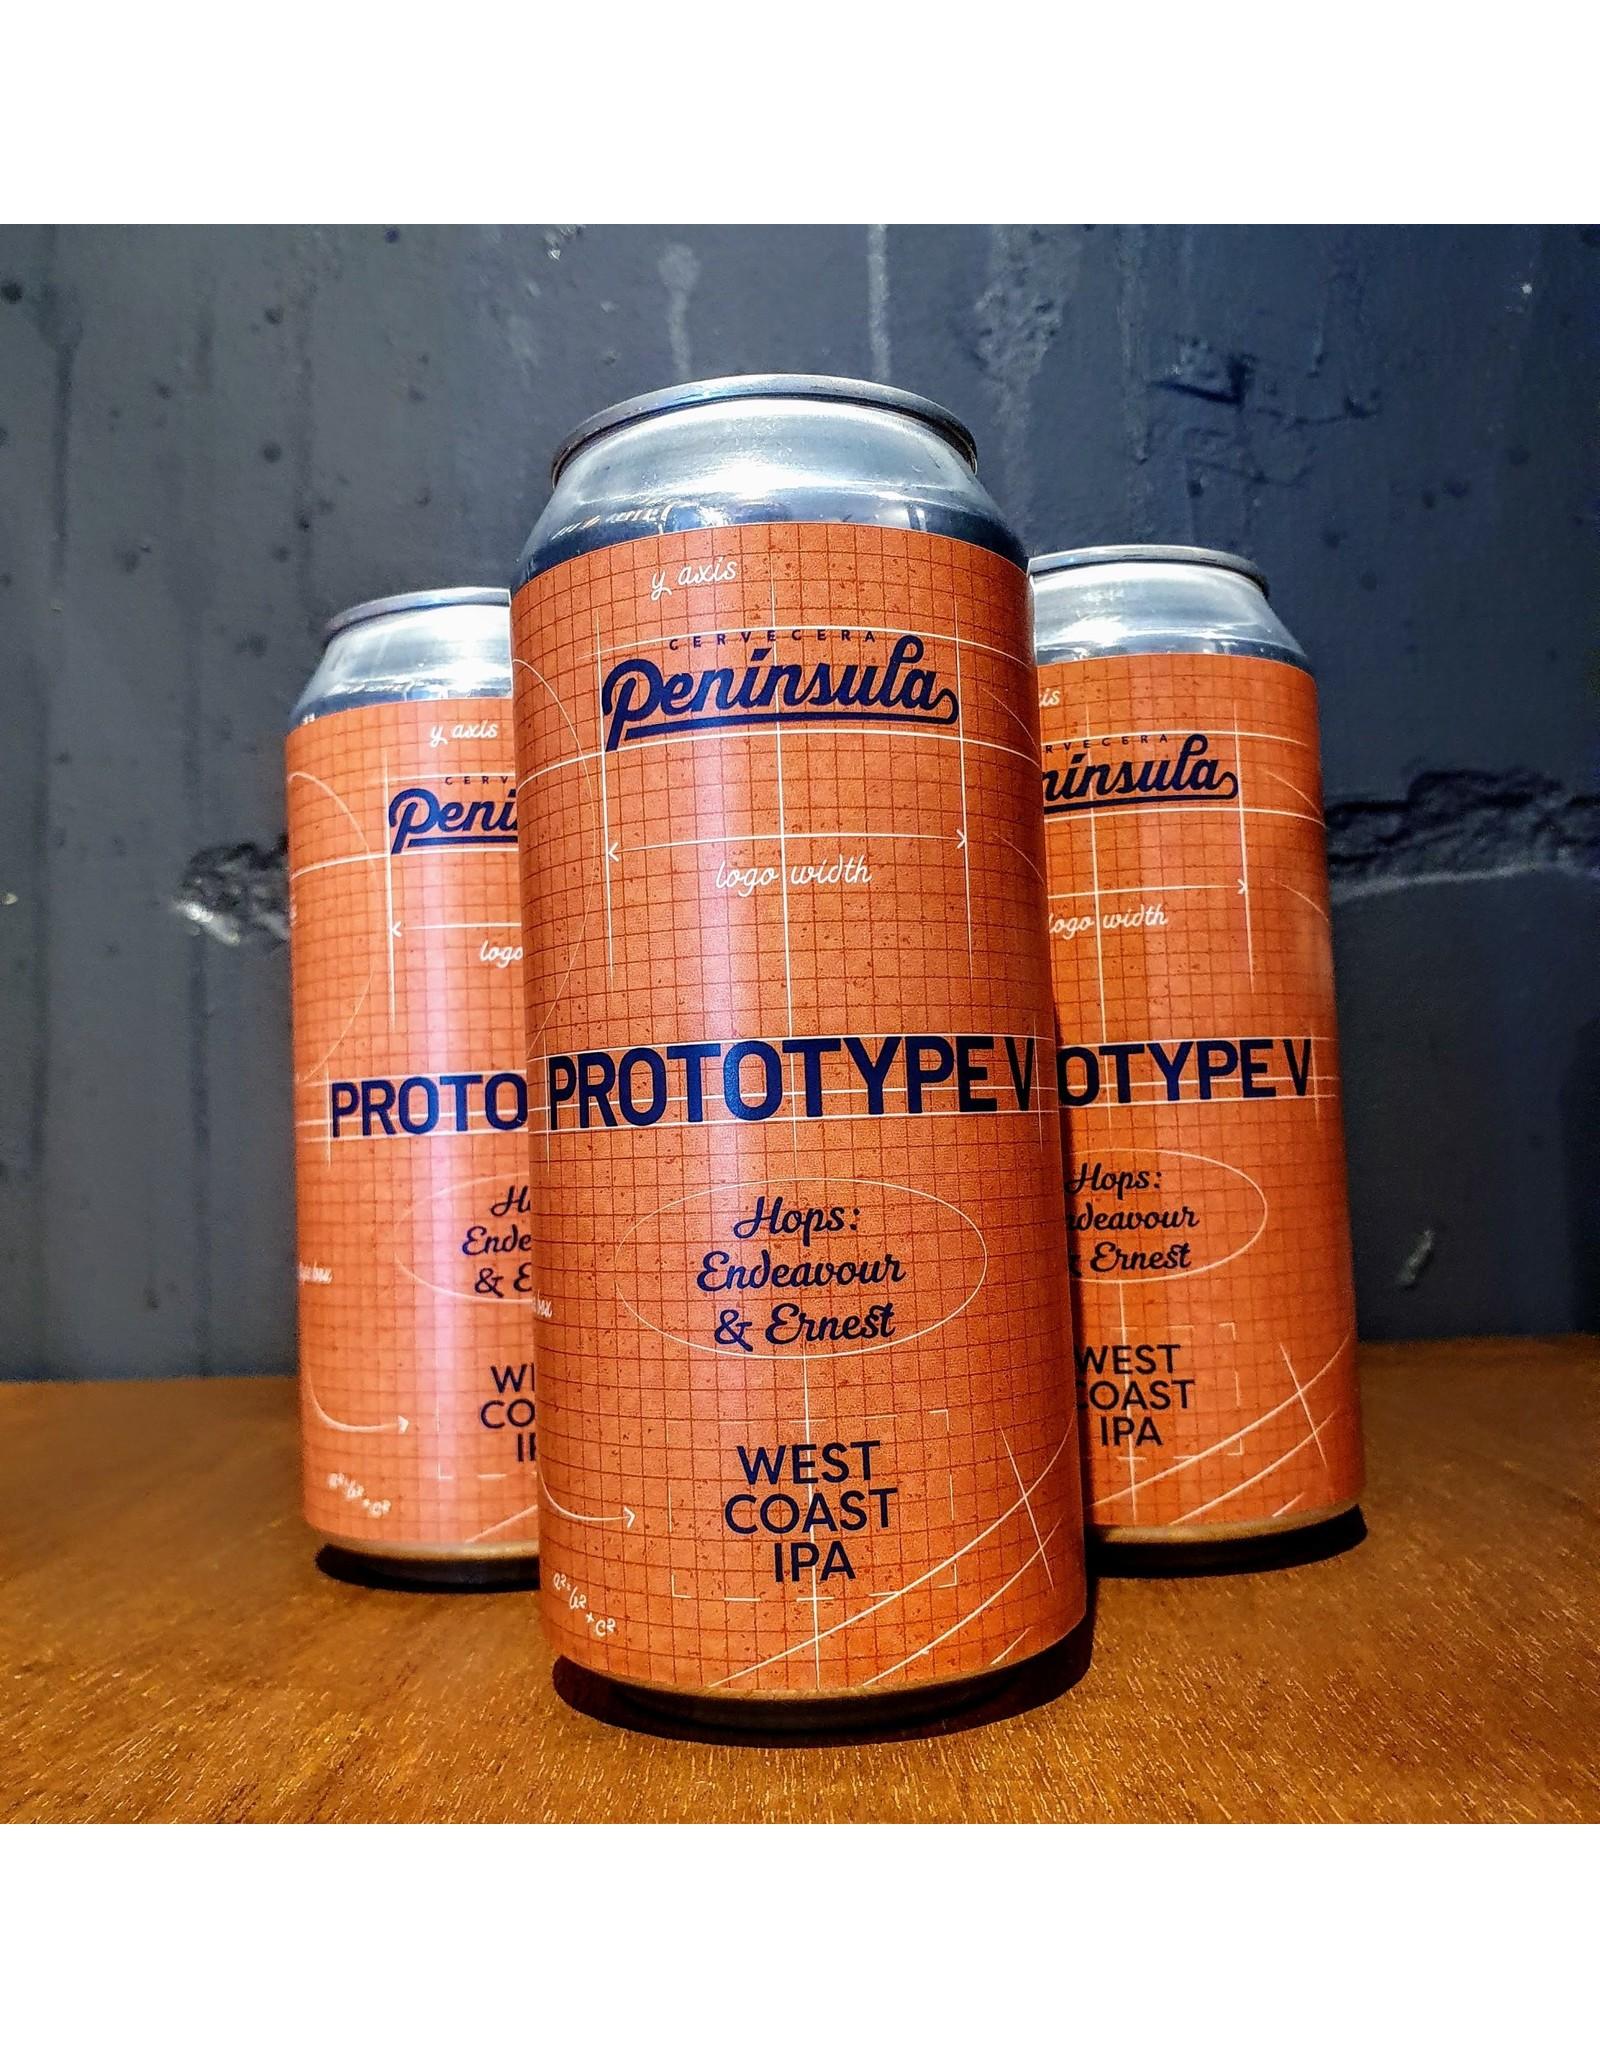 Peninsula - Prototype V